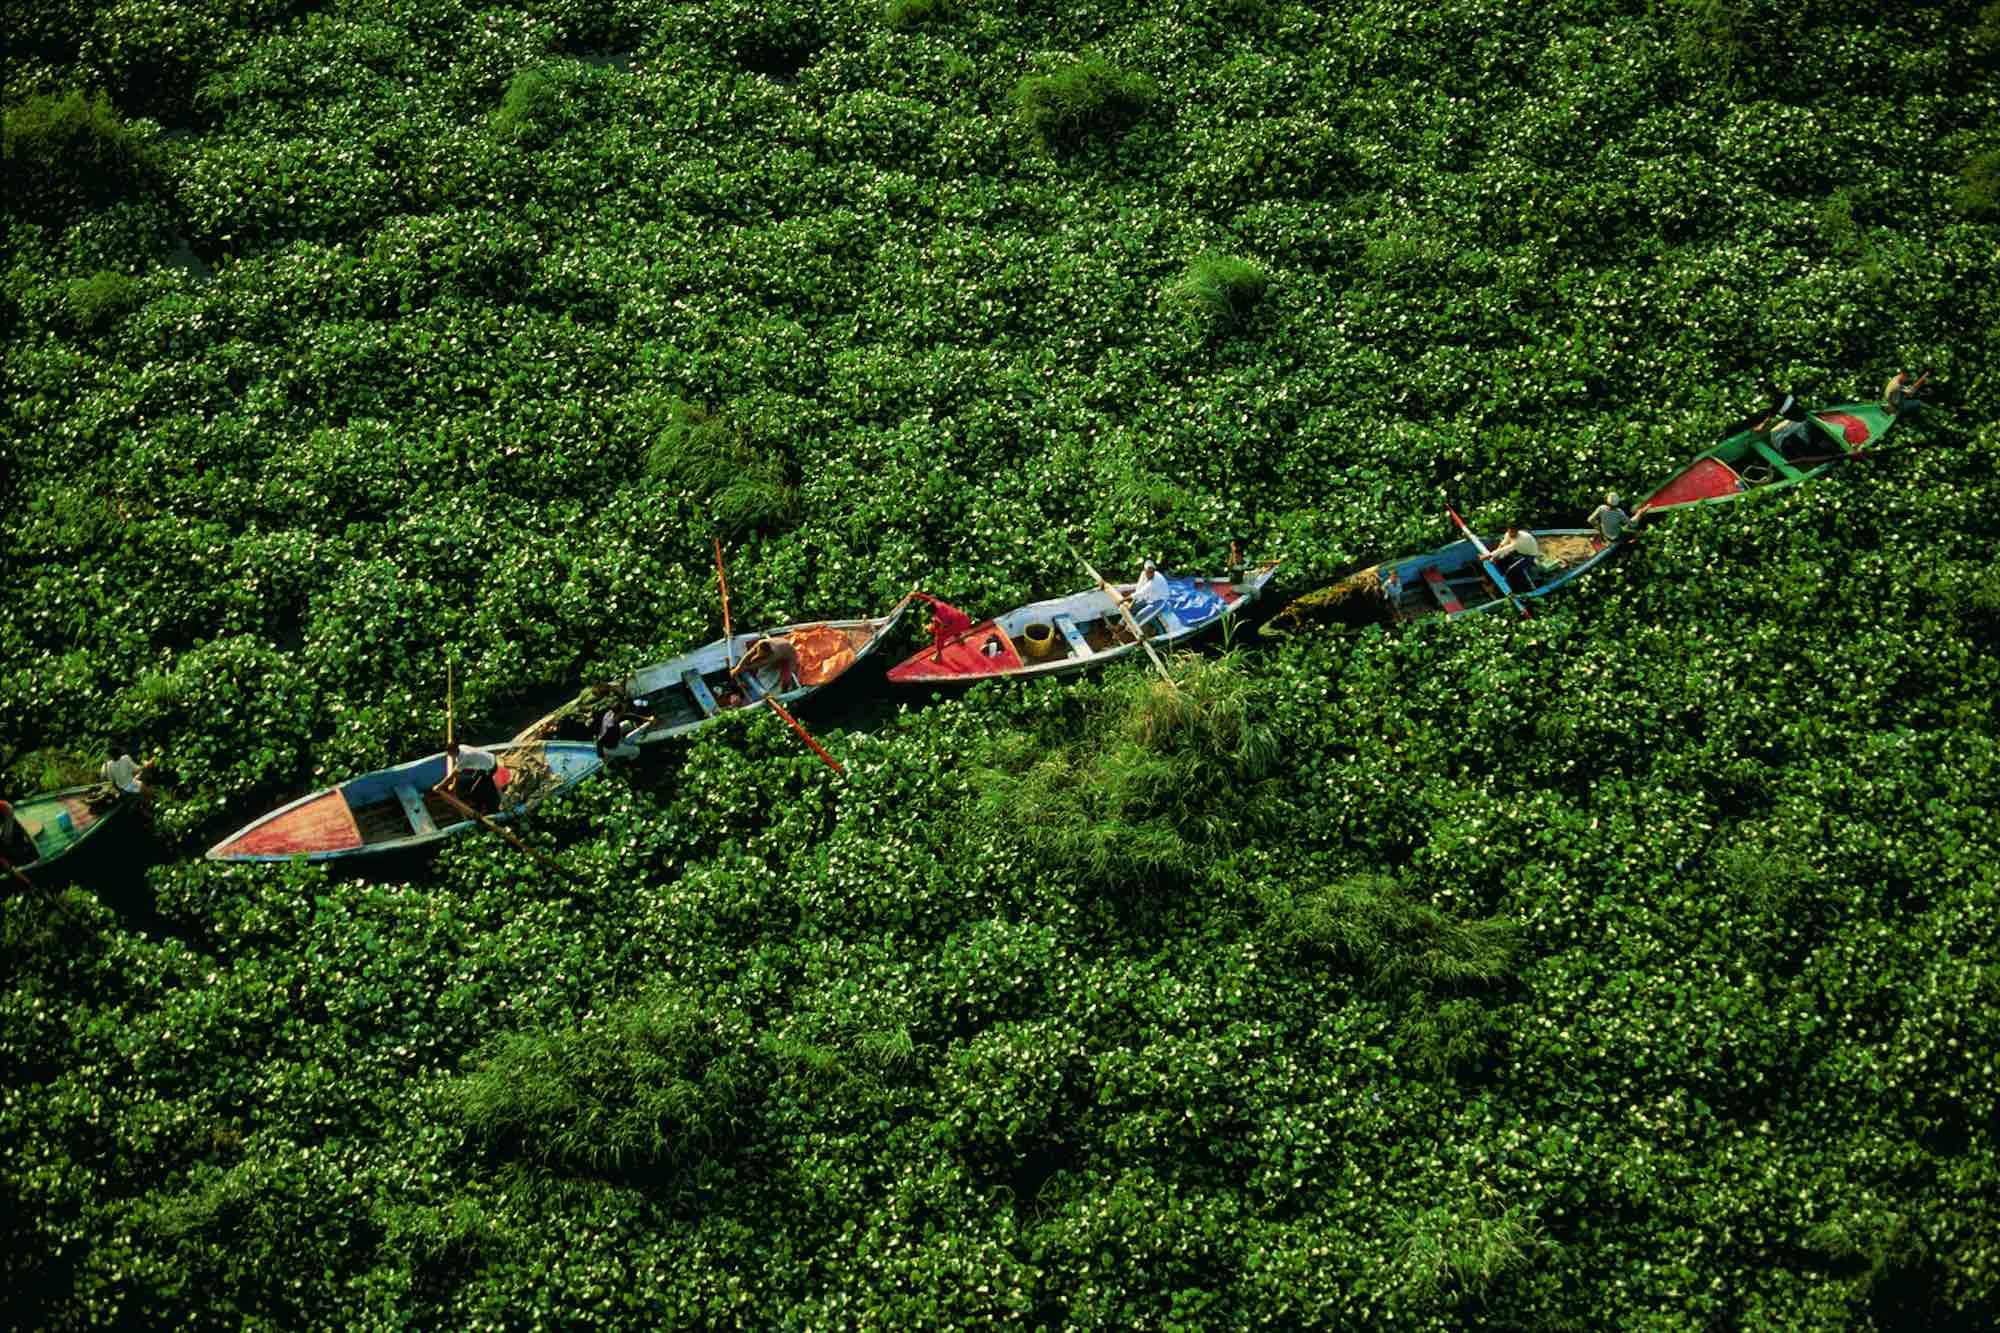 Water Hyacinths on the Nile - Yann Arthus-Bertrand